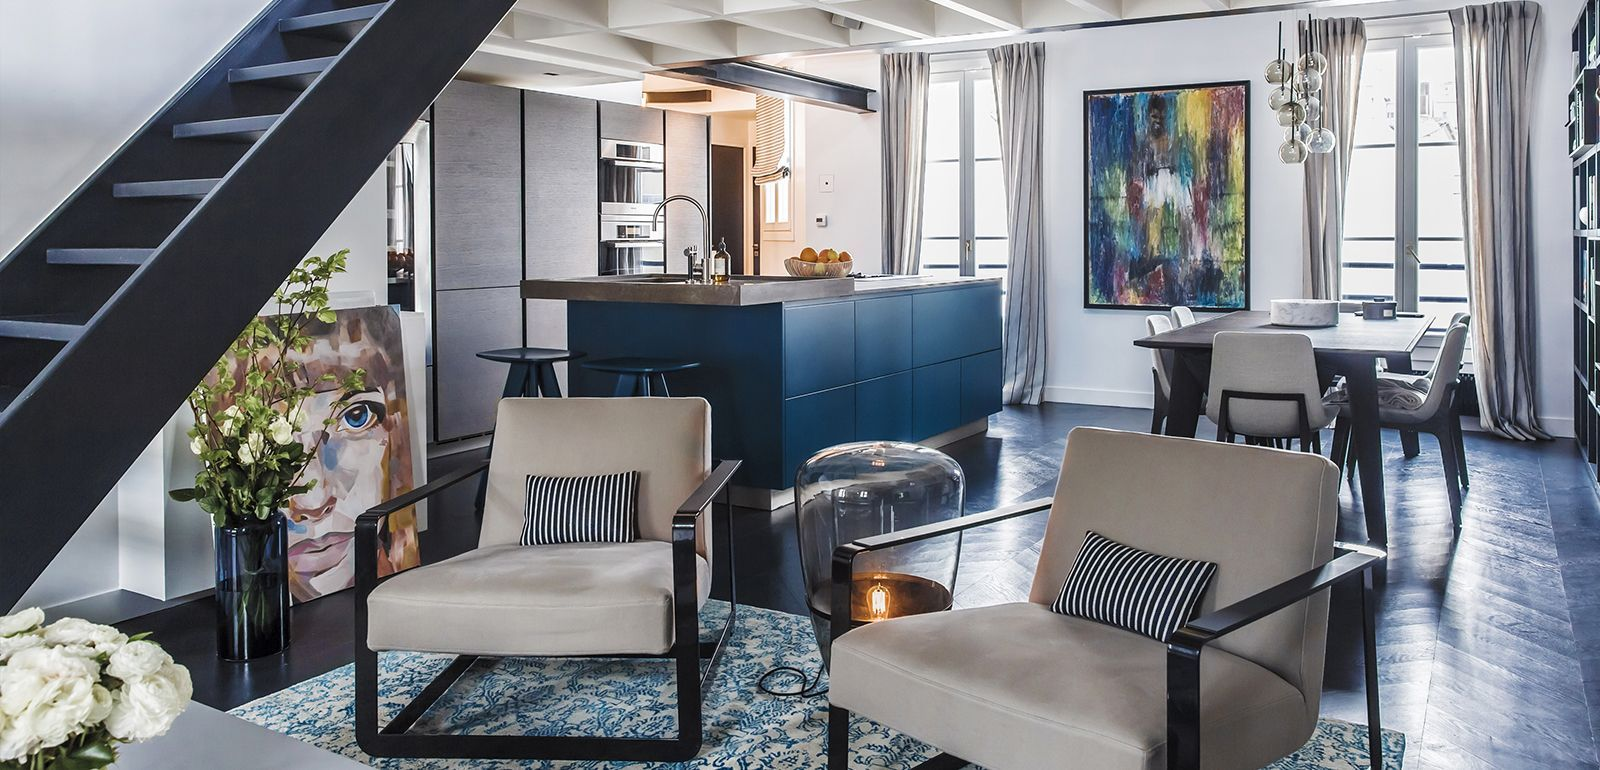 architect furniture interior design interior design silvera. Black Bedroom Furniture Sets. Home Design Ideas